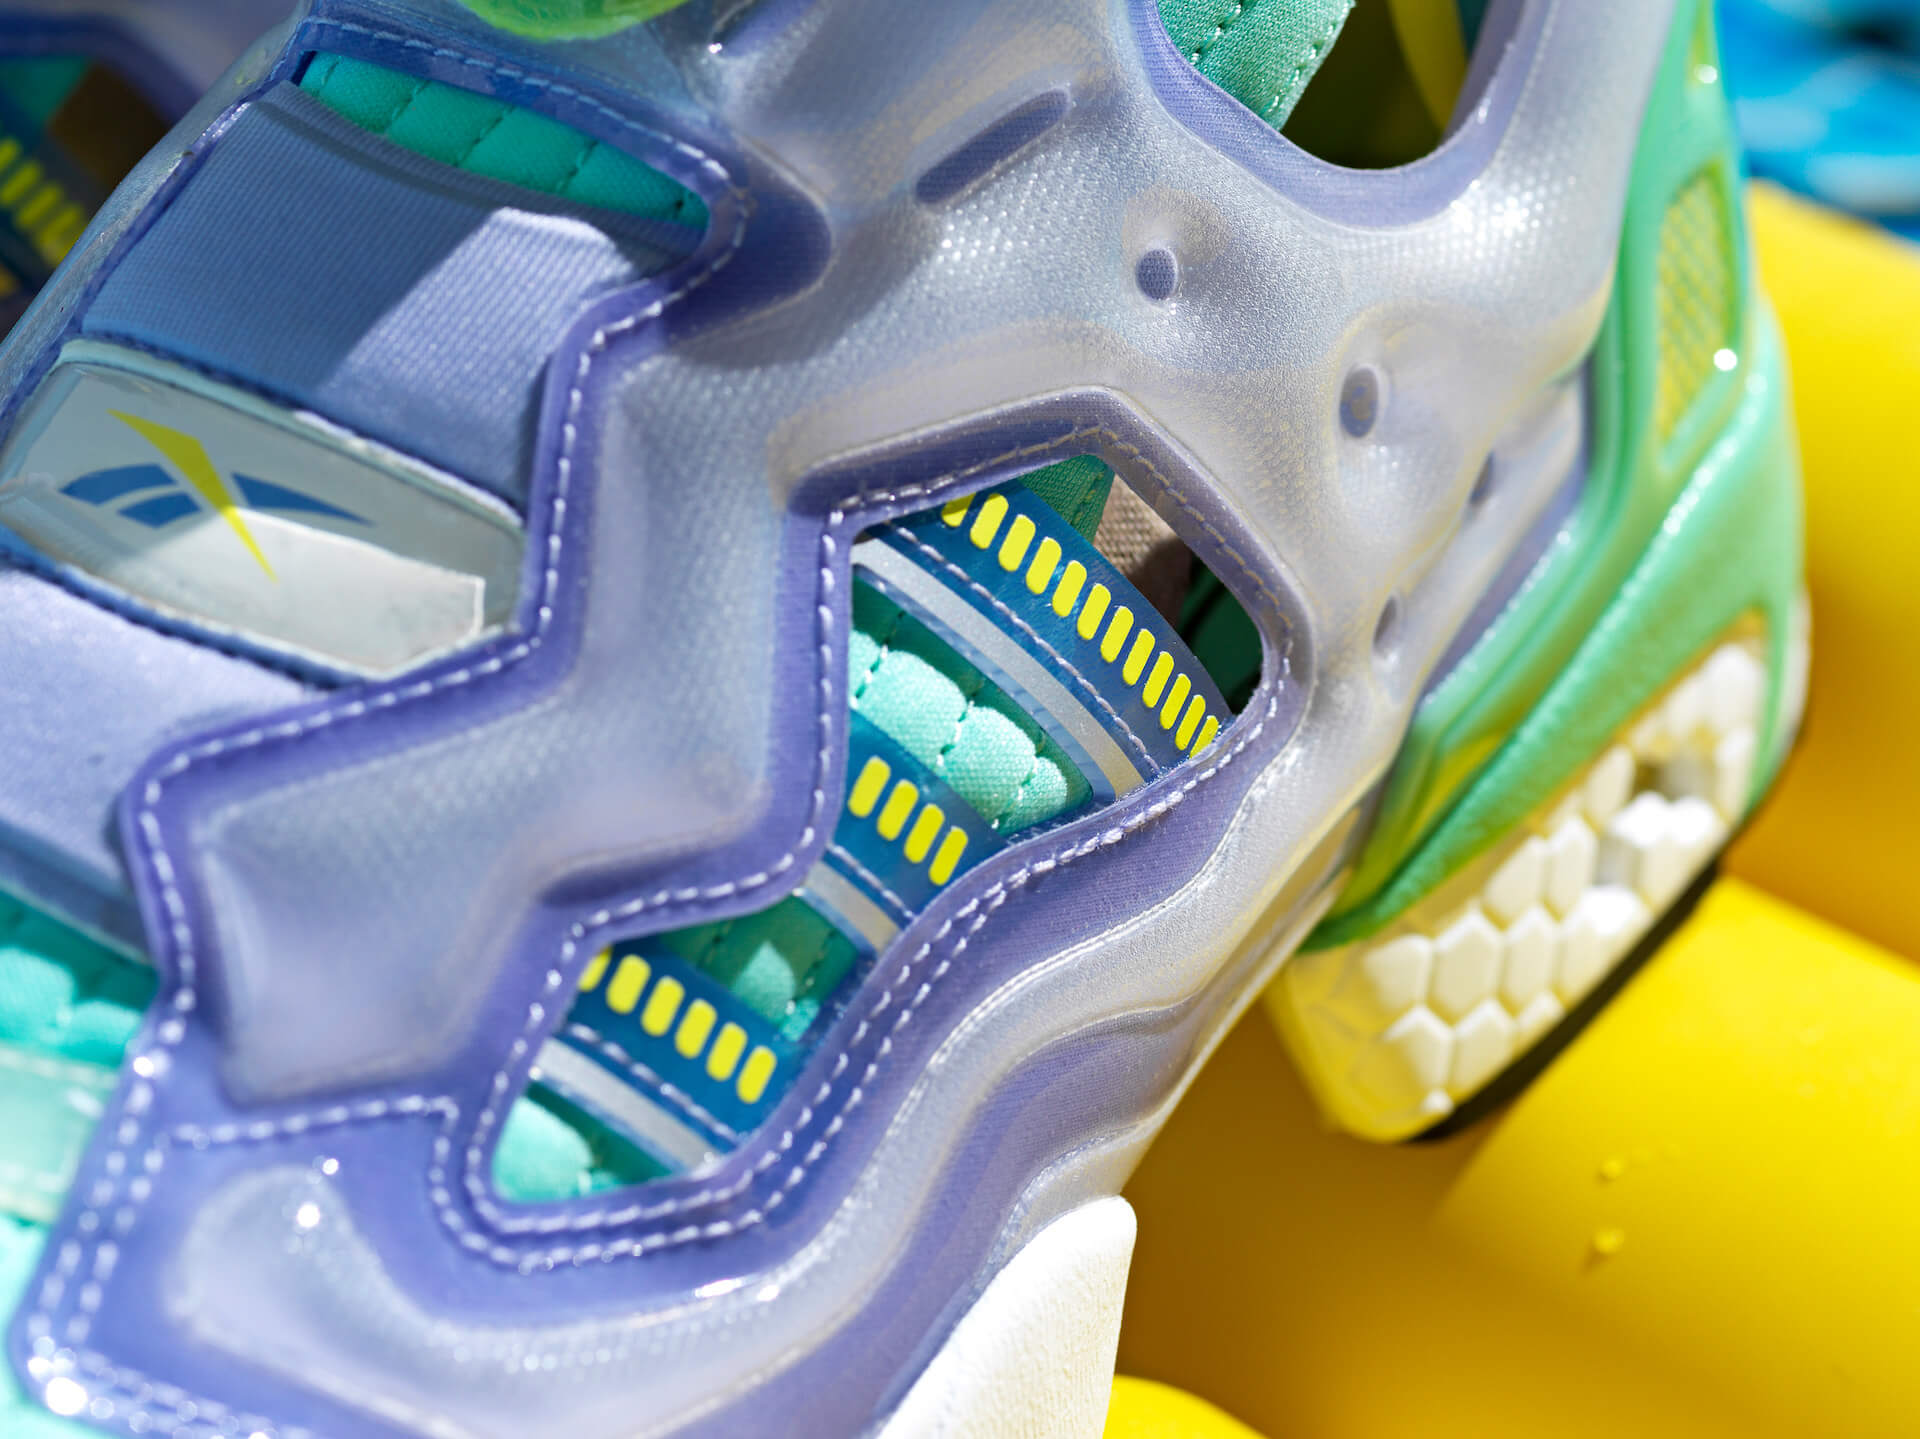 adidas OriginalsとReebokのコラボモデル「ZX FURY」に夏にぴったりの新色4色が登場! life210719_adidasoriginals_reebok_10